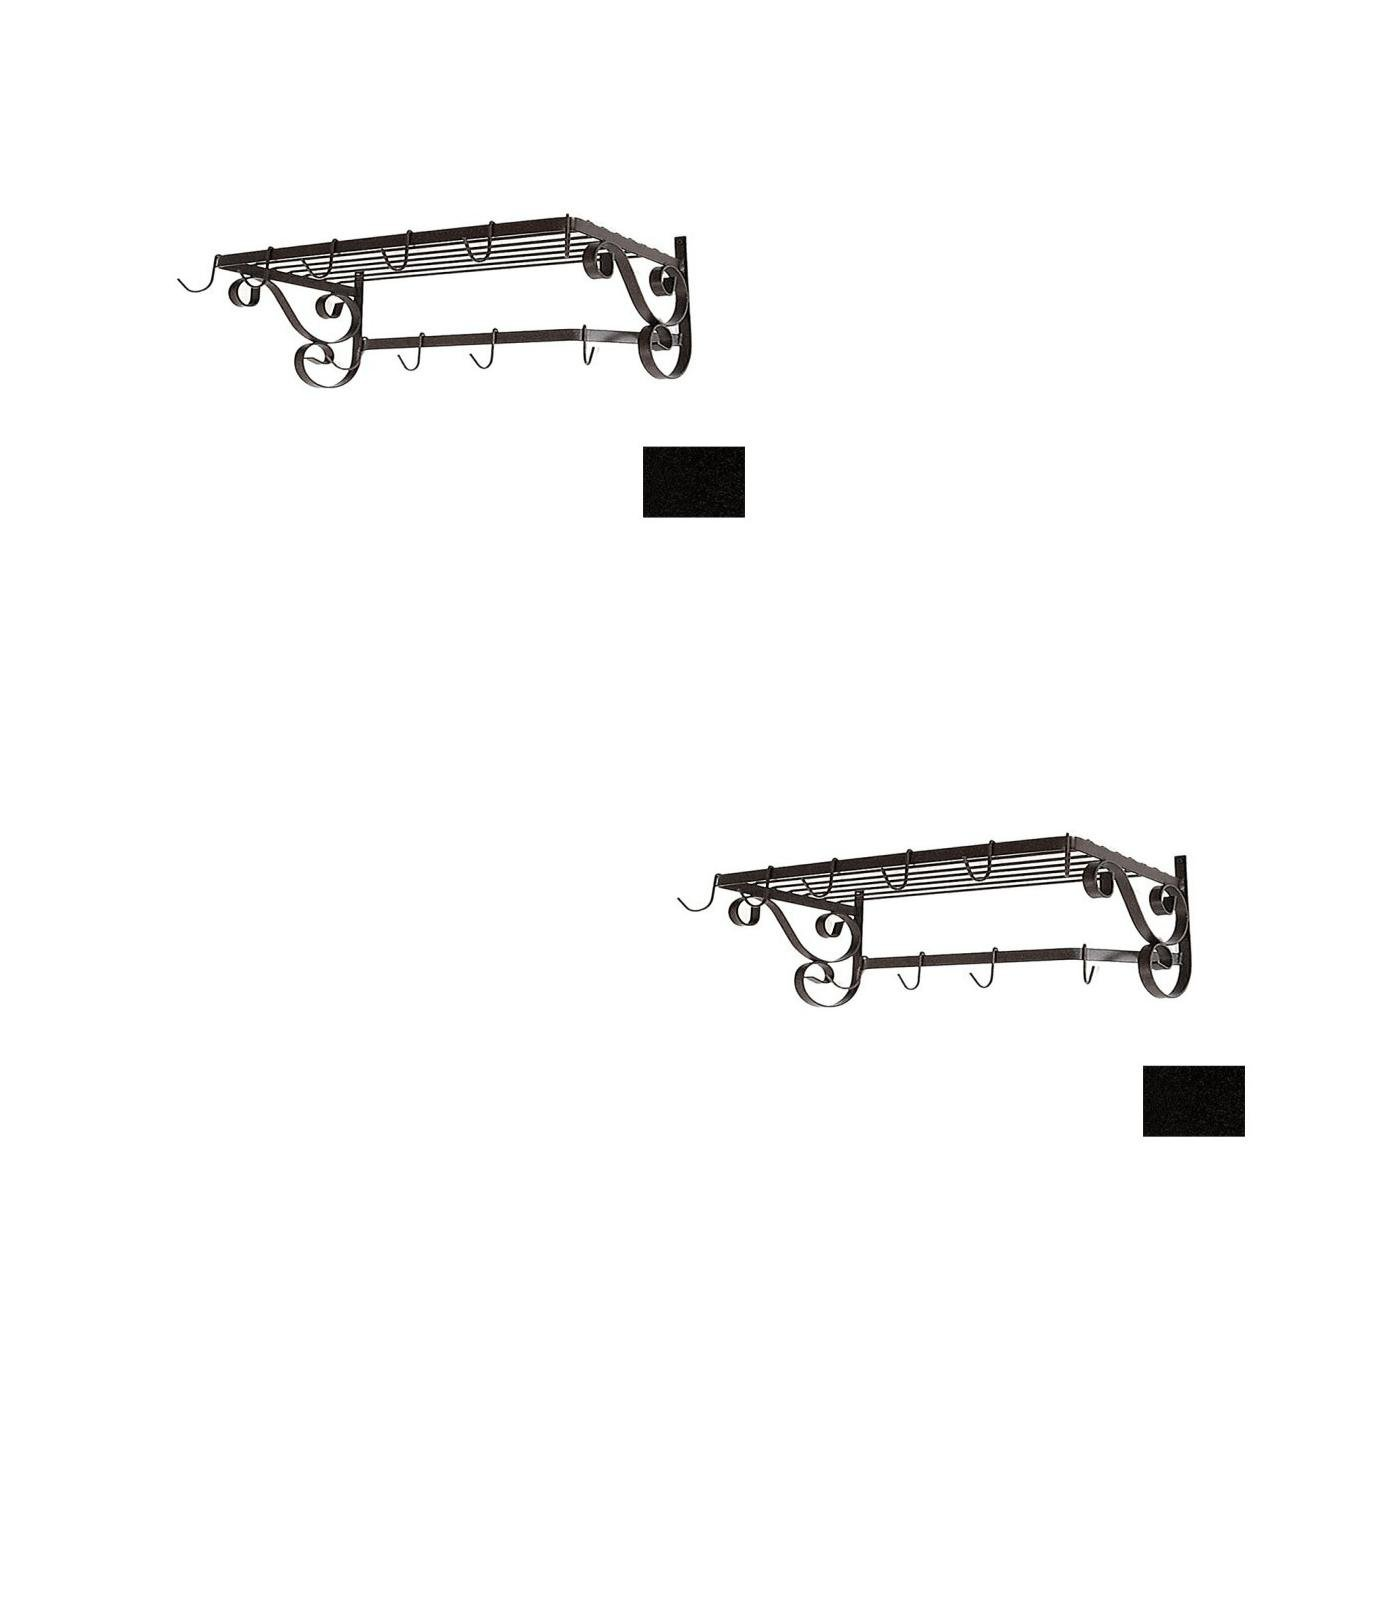 24-1/2-in x 13-in Satin Black Rectangle Pot Rack - Grace Collection Model - GMC-WR24-UB-SB - Set of 2 Gift Bundle